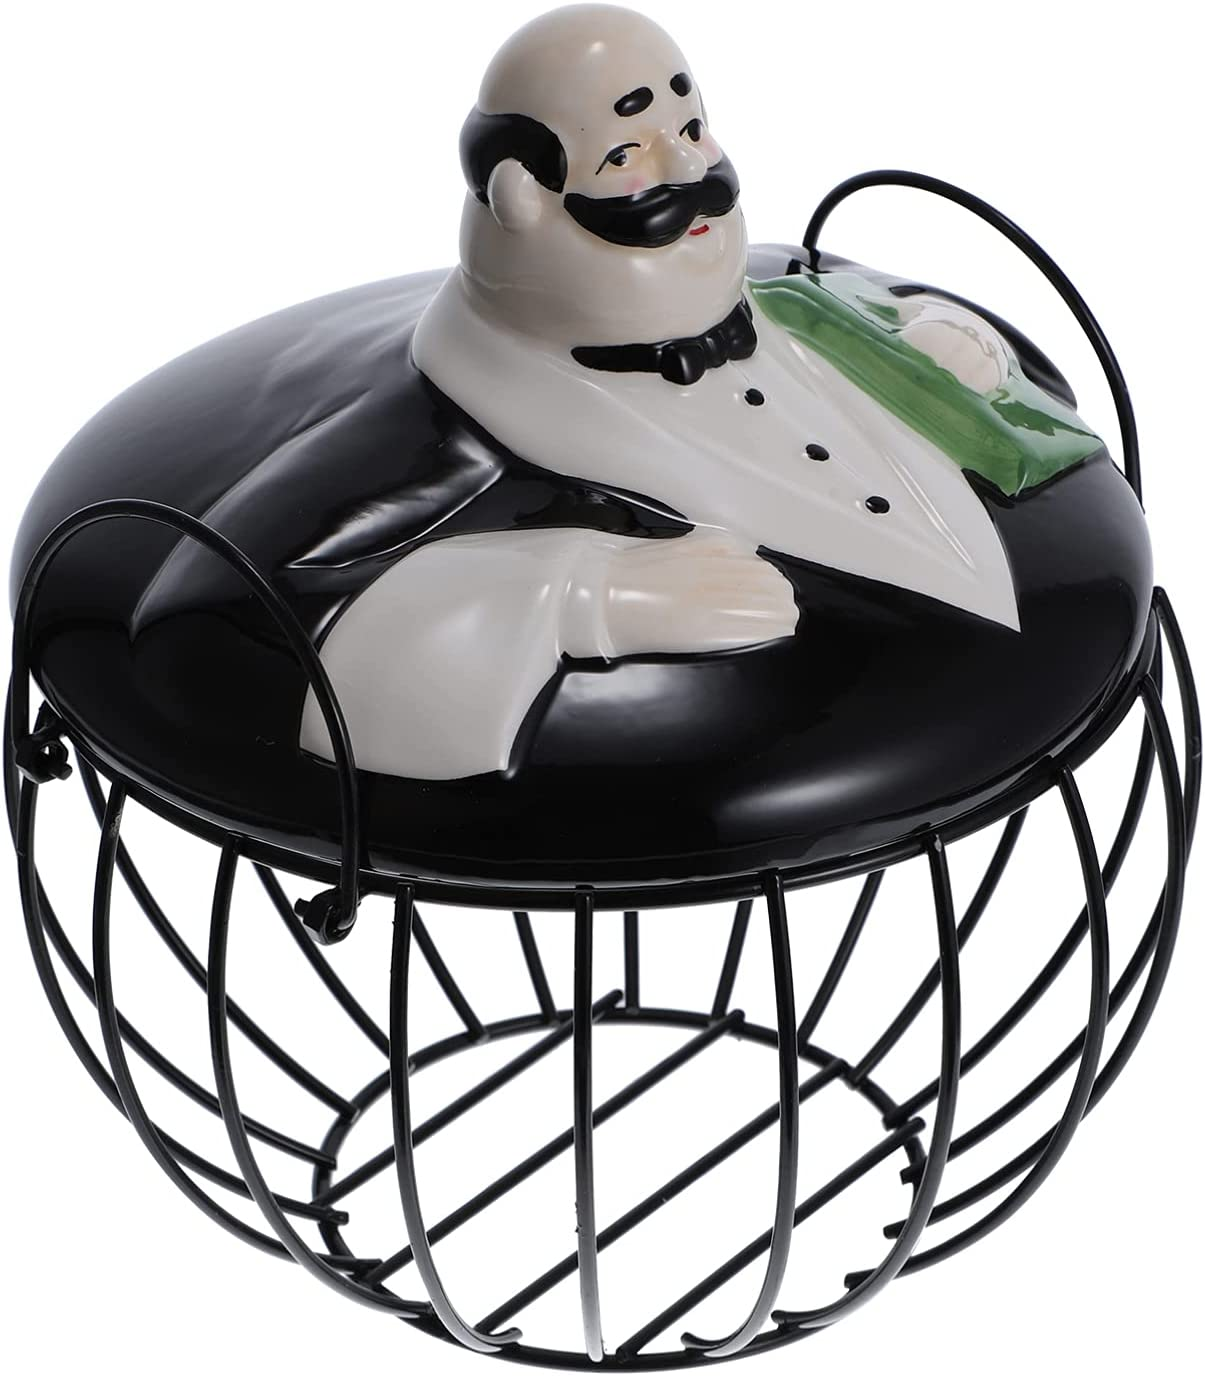 YARNOW Kitchen Storage Metal Wire supreme with Basket Waiter Egg Free shipping on posting reviews Ceramic